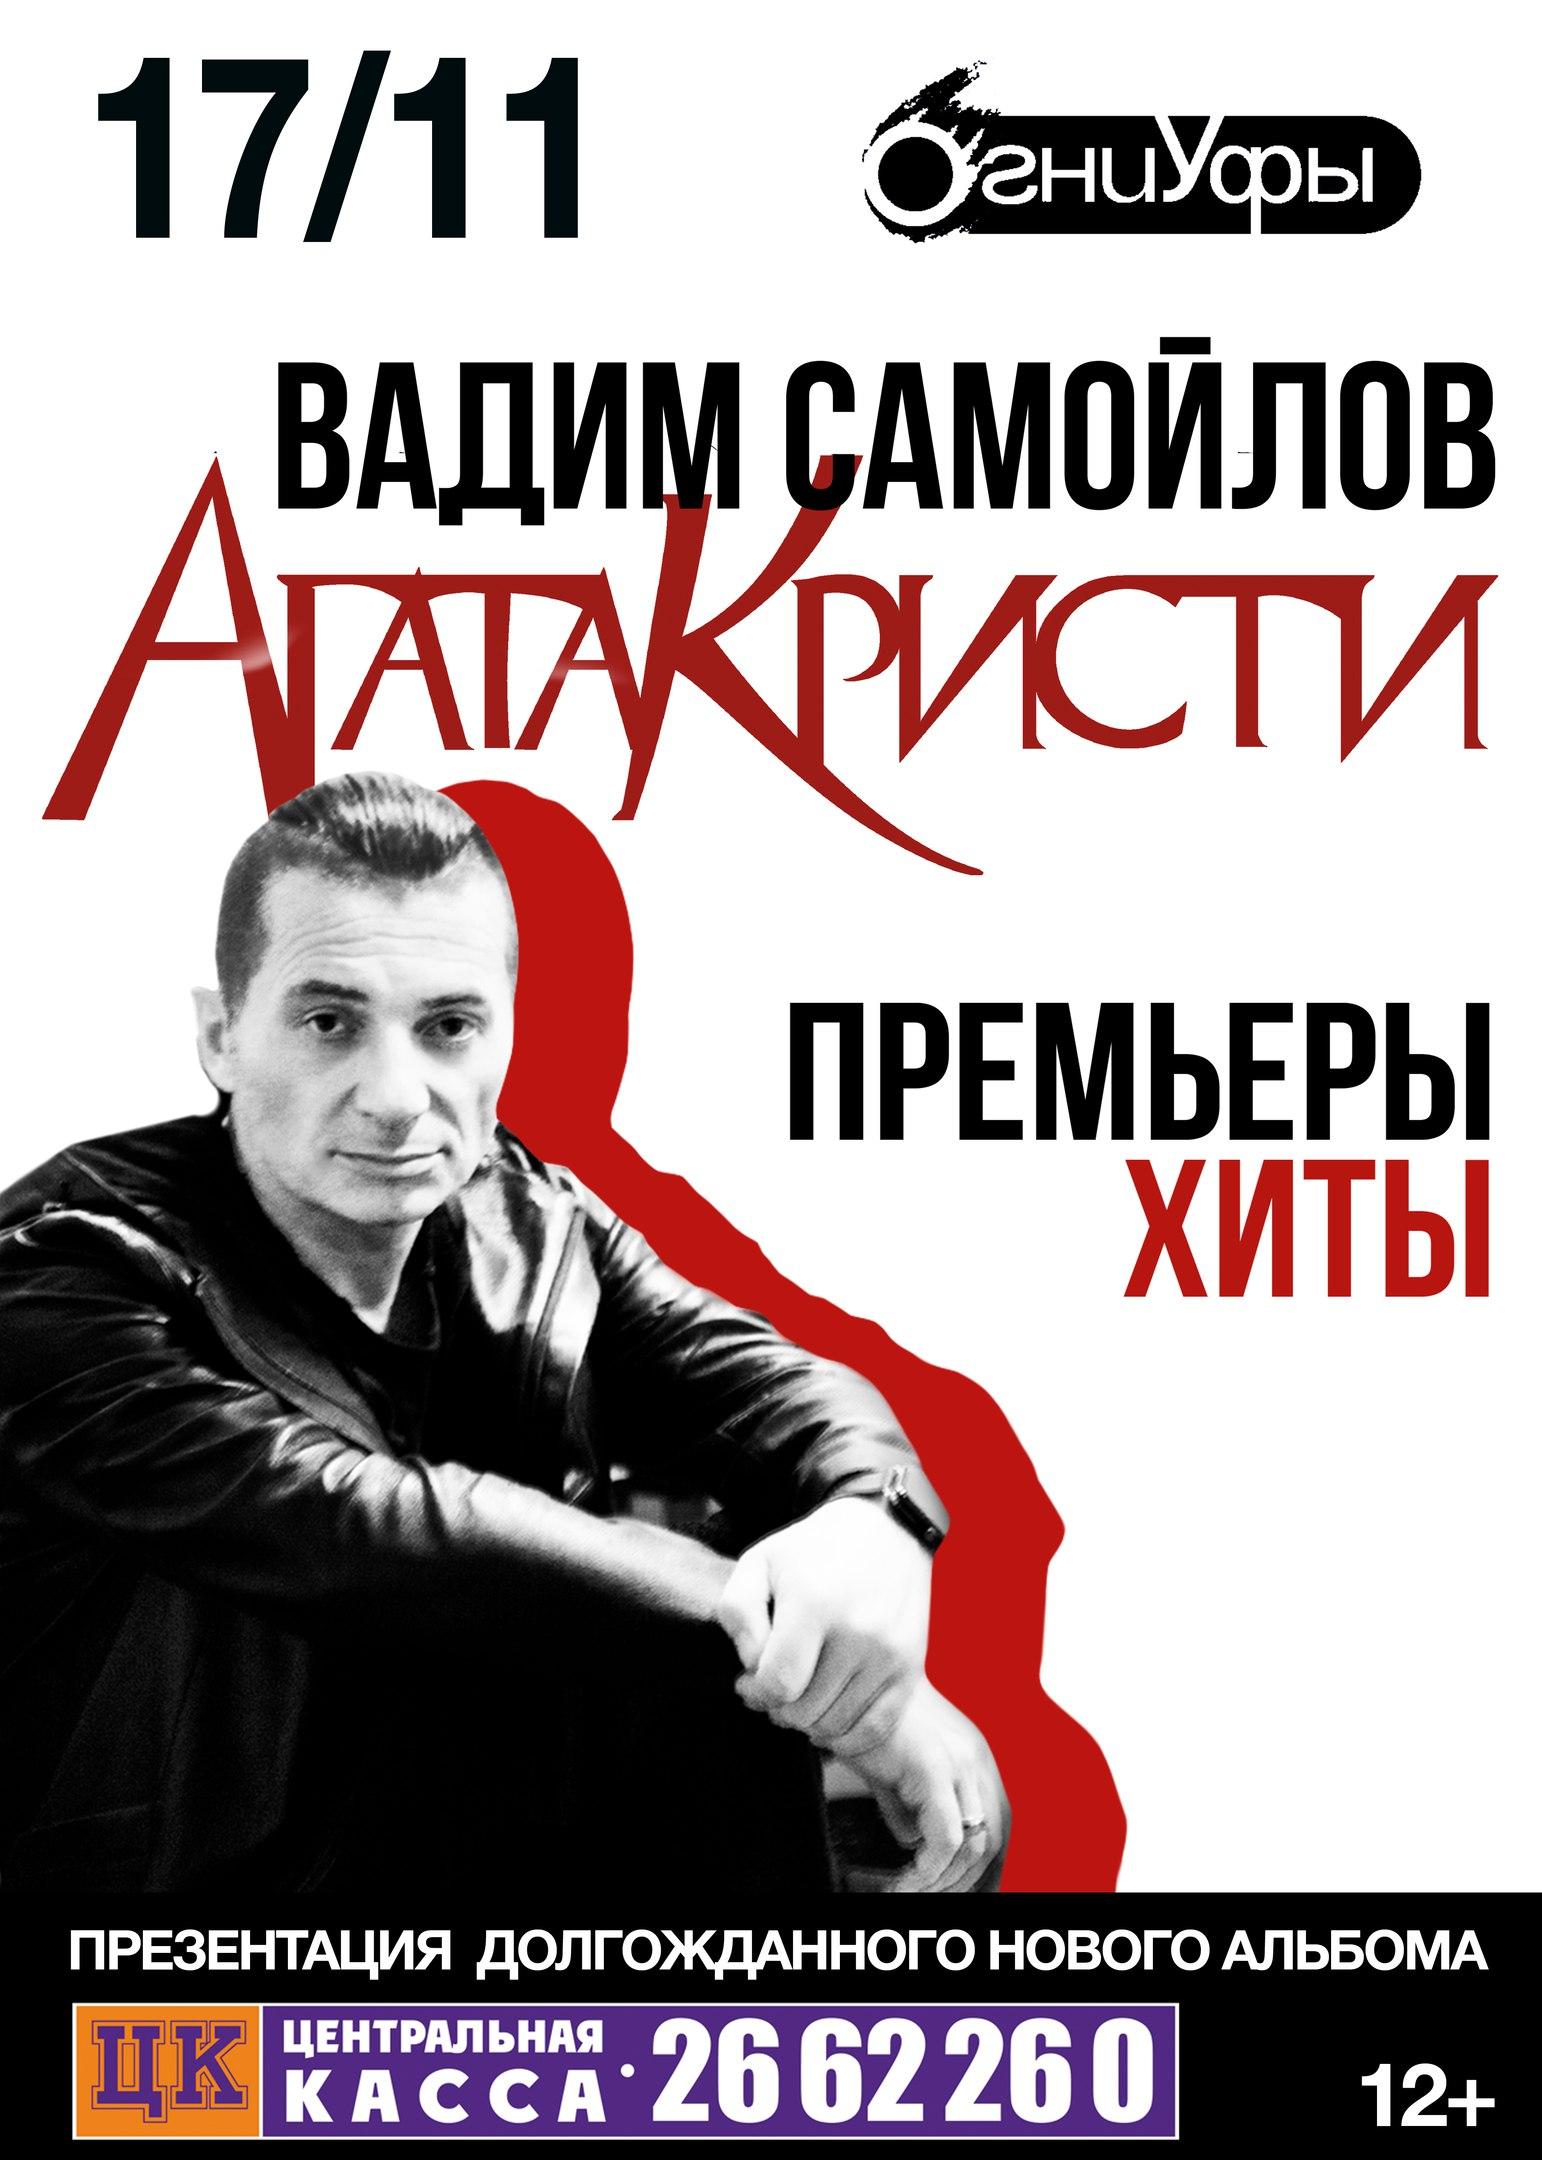 Афиша уфа концерты 2017 огни уфы билеты на концерт resonance